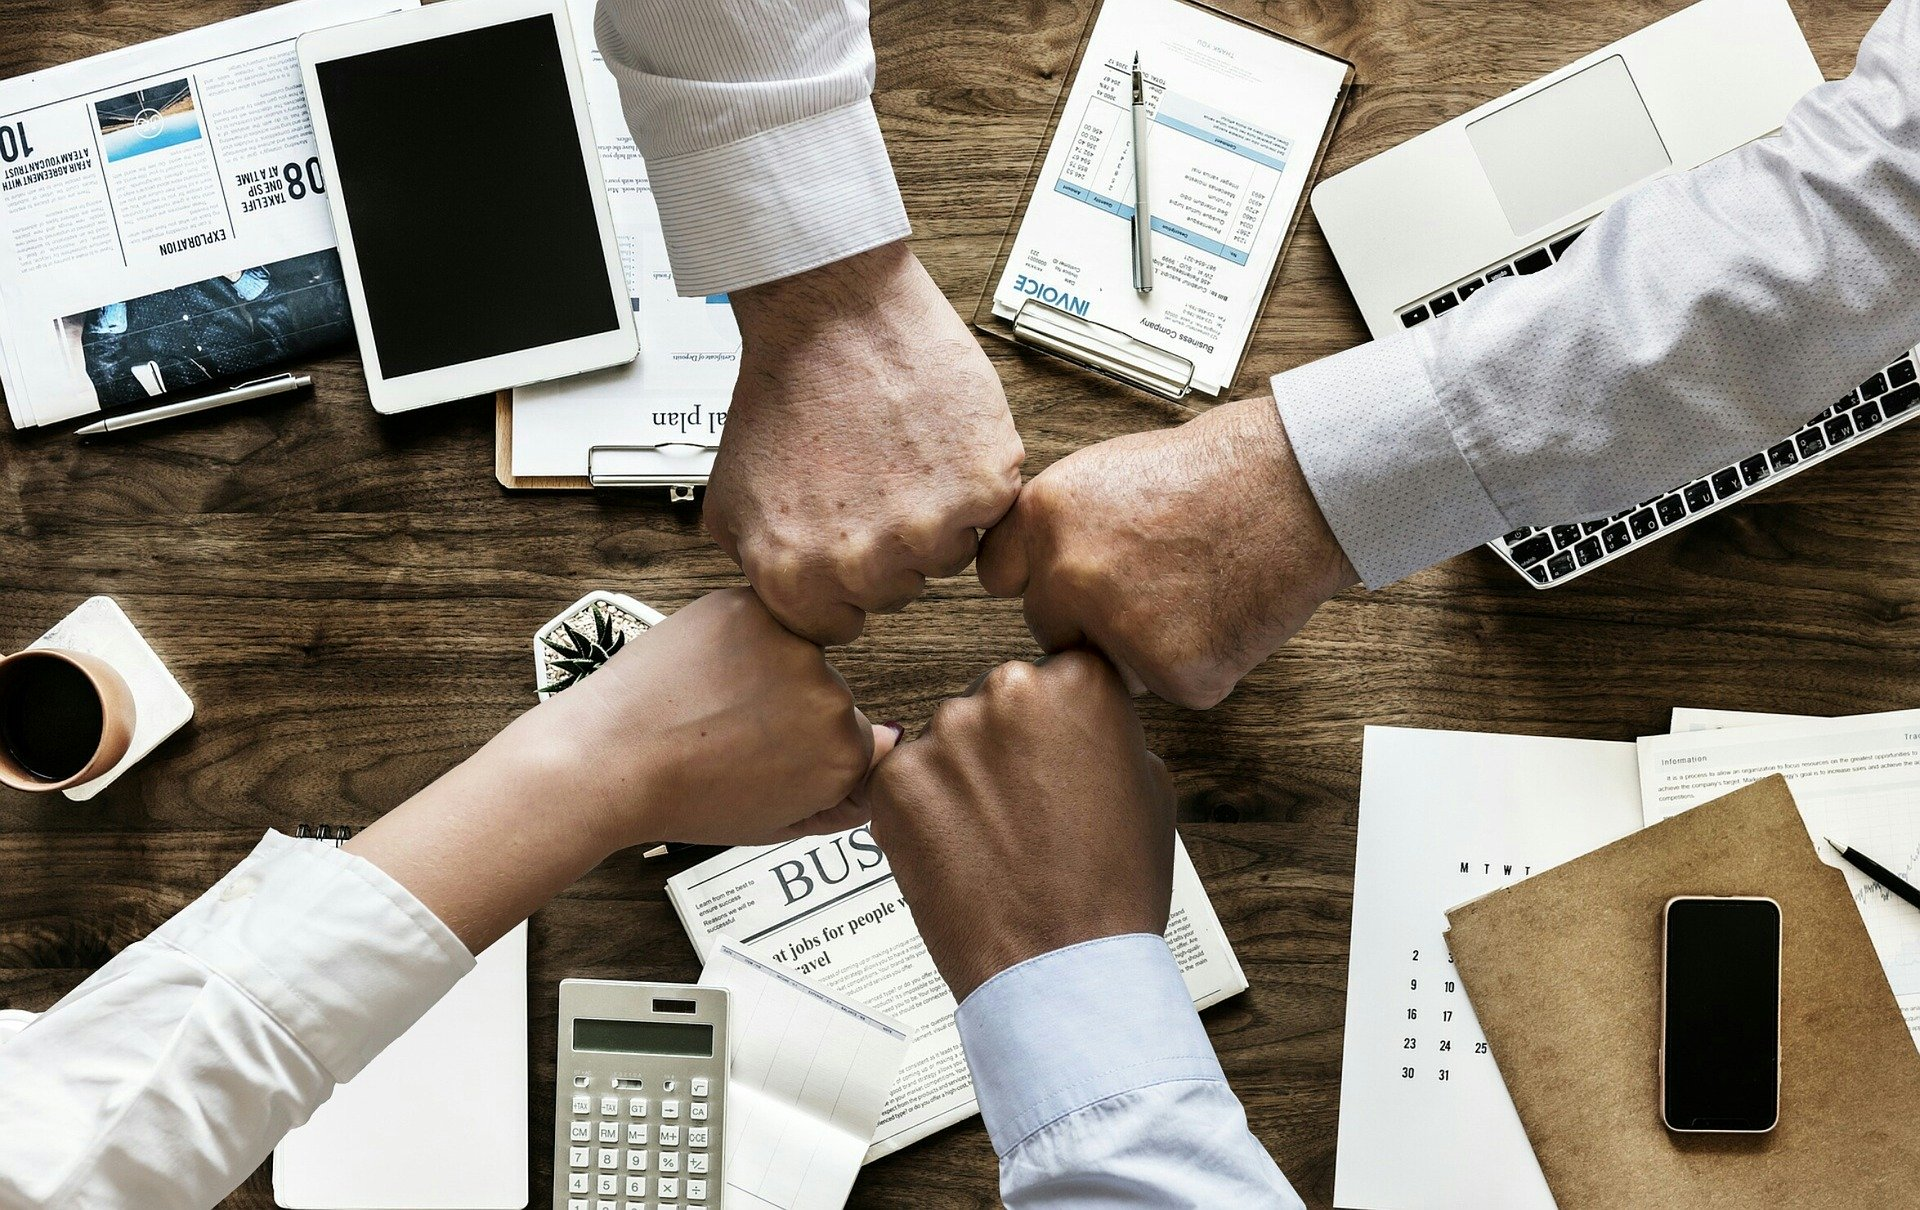 Plattform start-ups mittelstand